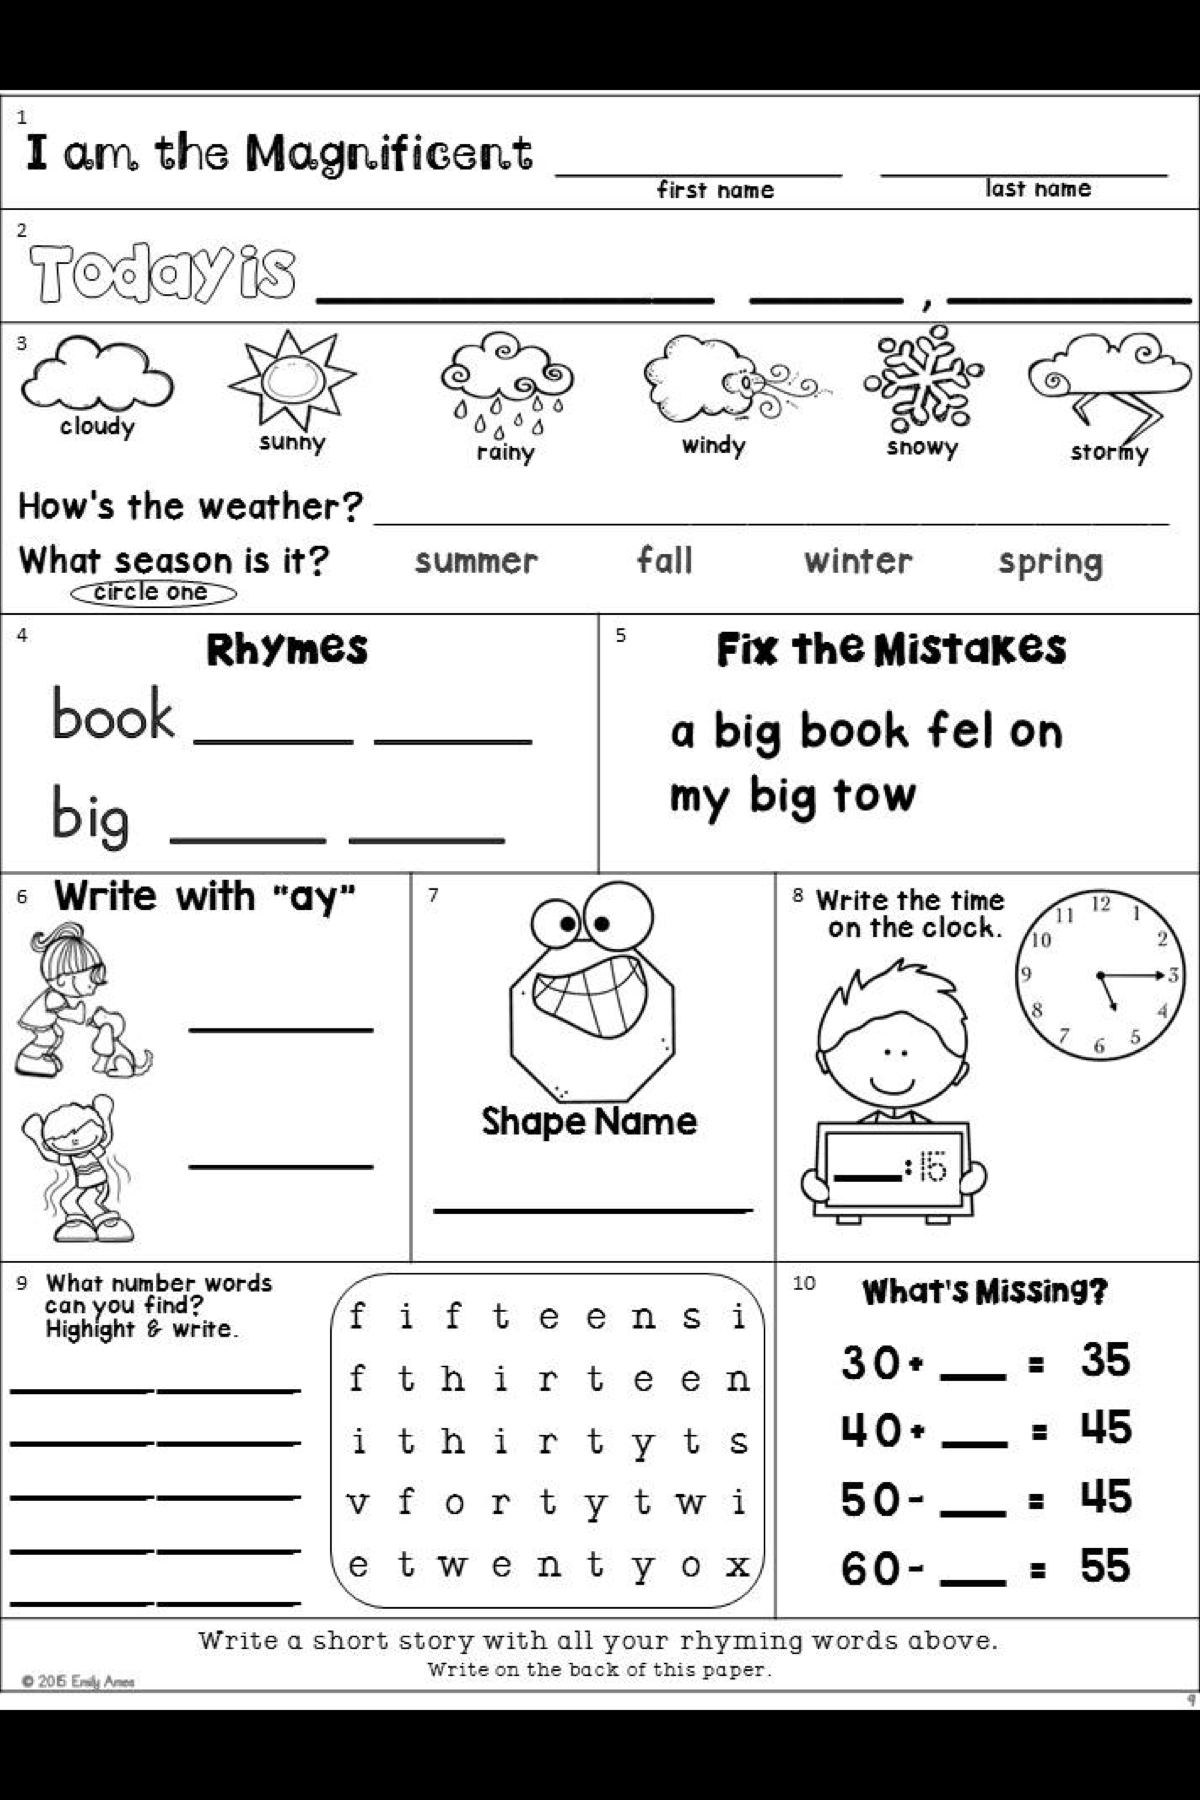 Second Grade Morning Work Freebie   Morning work freebie [ 1800 x 1200 Pixel ]